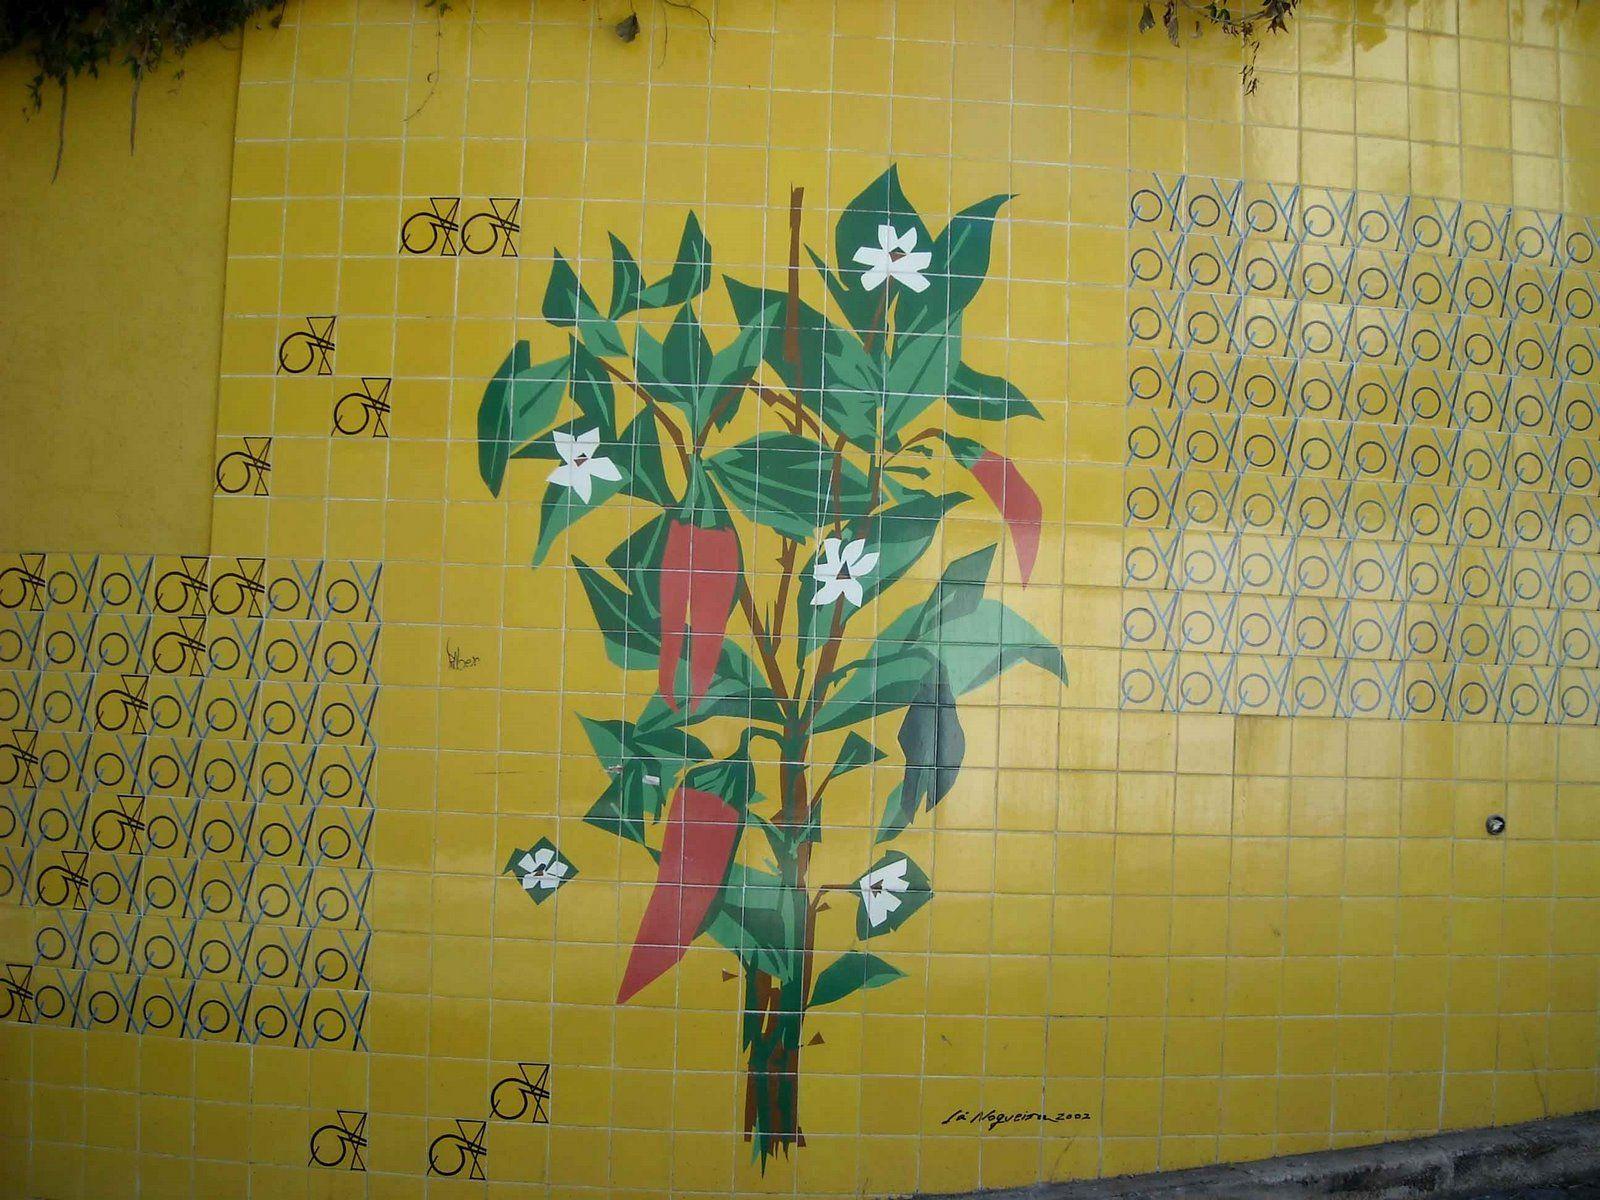 Azulejo - Sa Nogueira - WikiArt.org